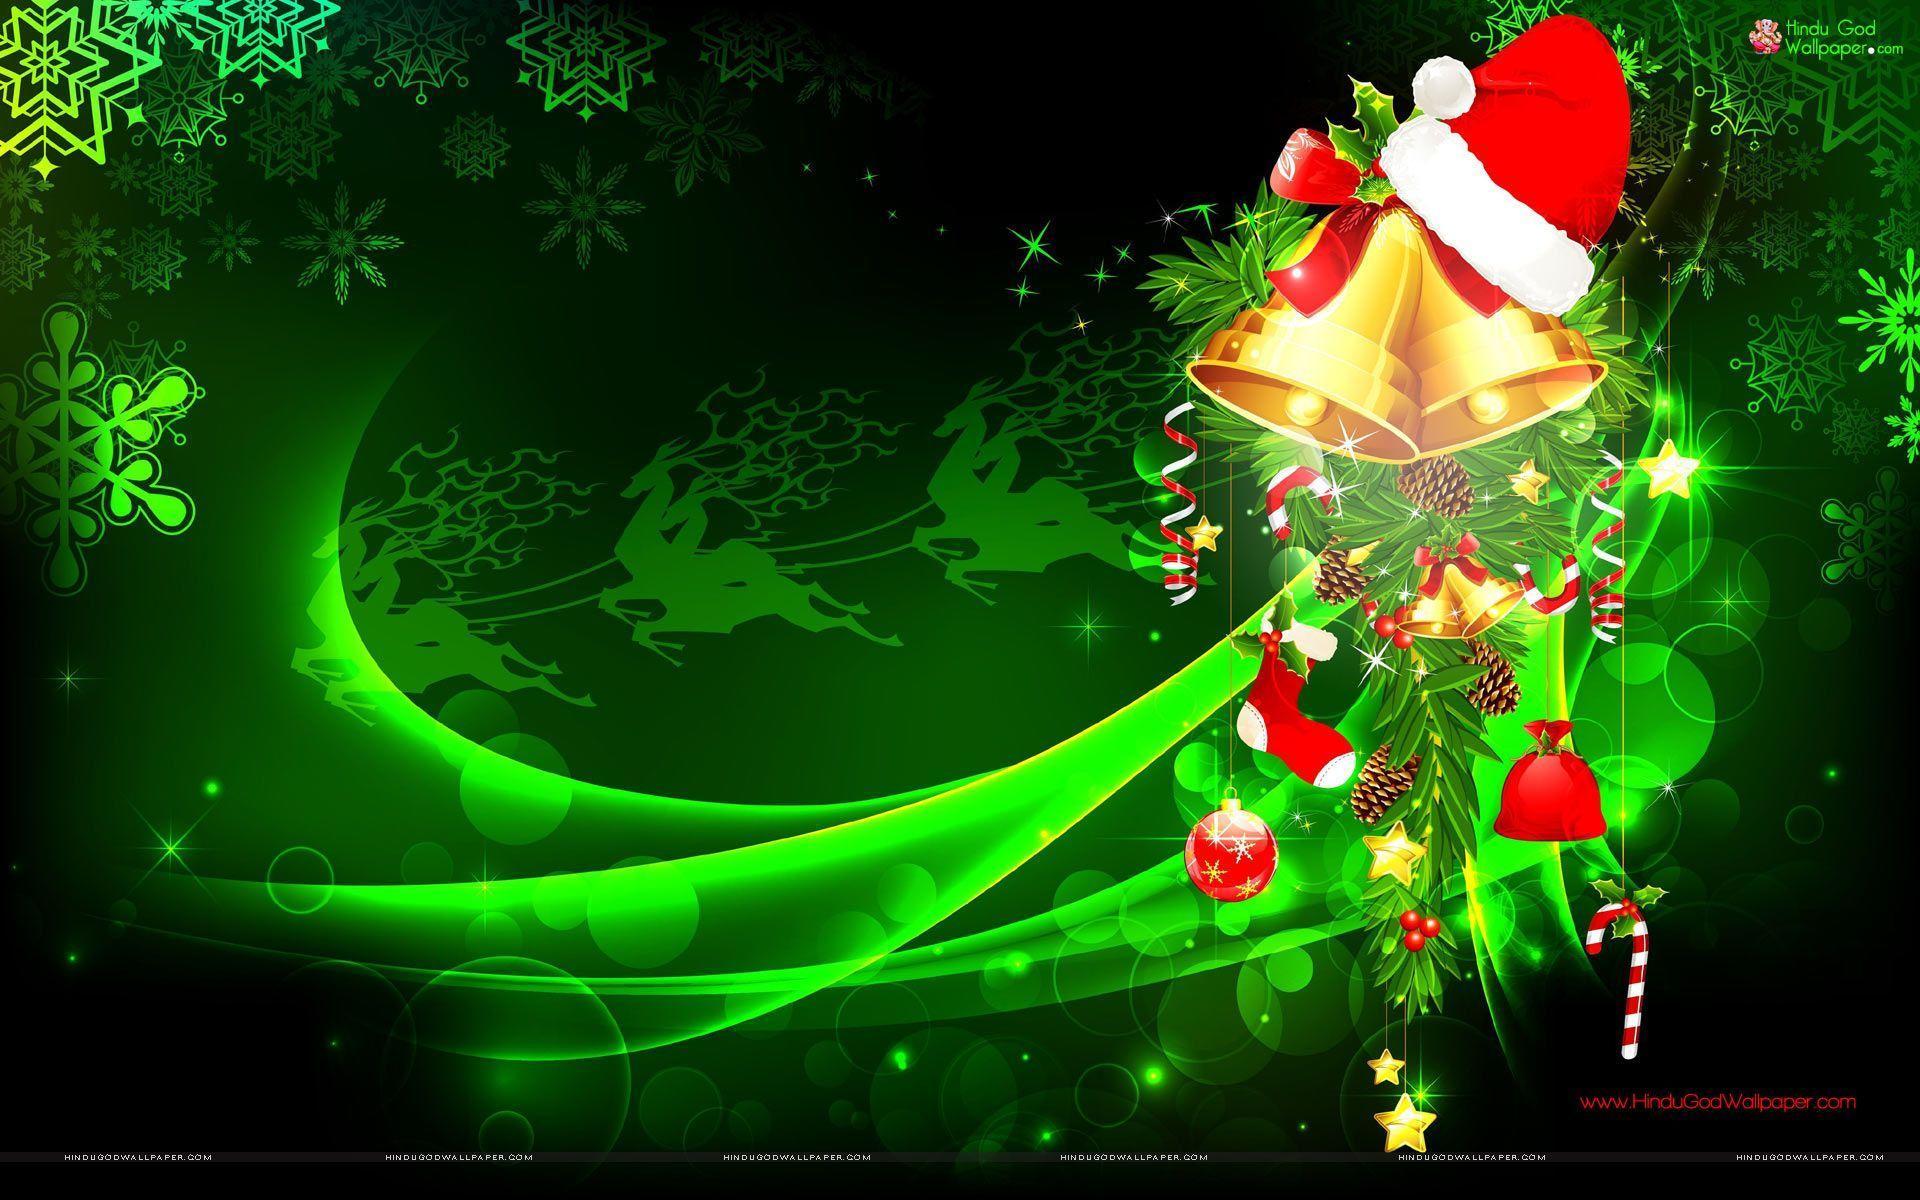 Green Christmas Wallpapers - Top Free Green Christmas ...